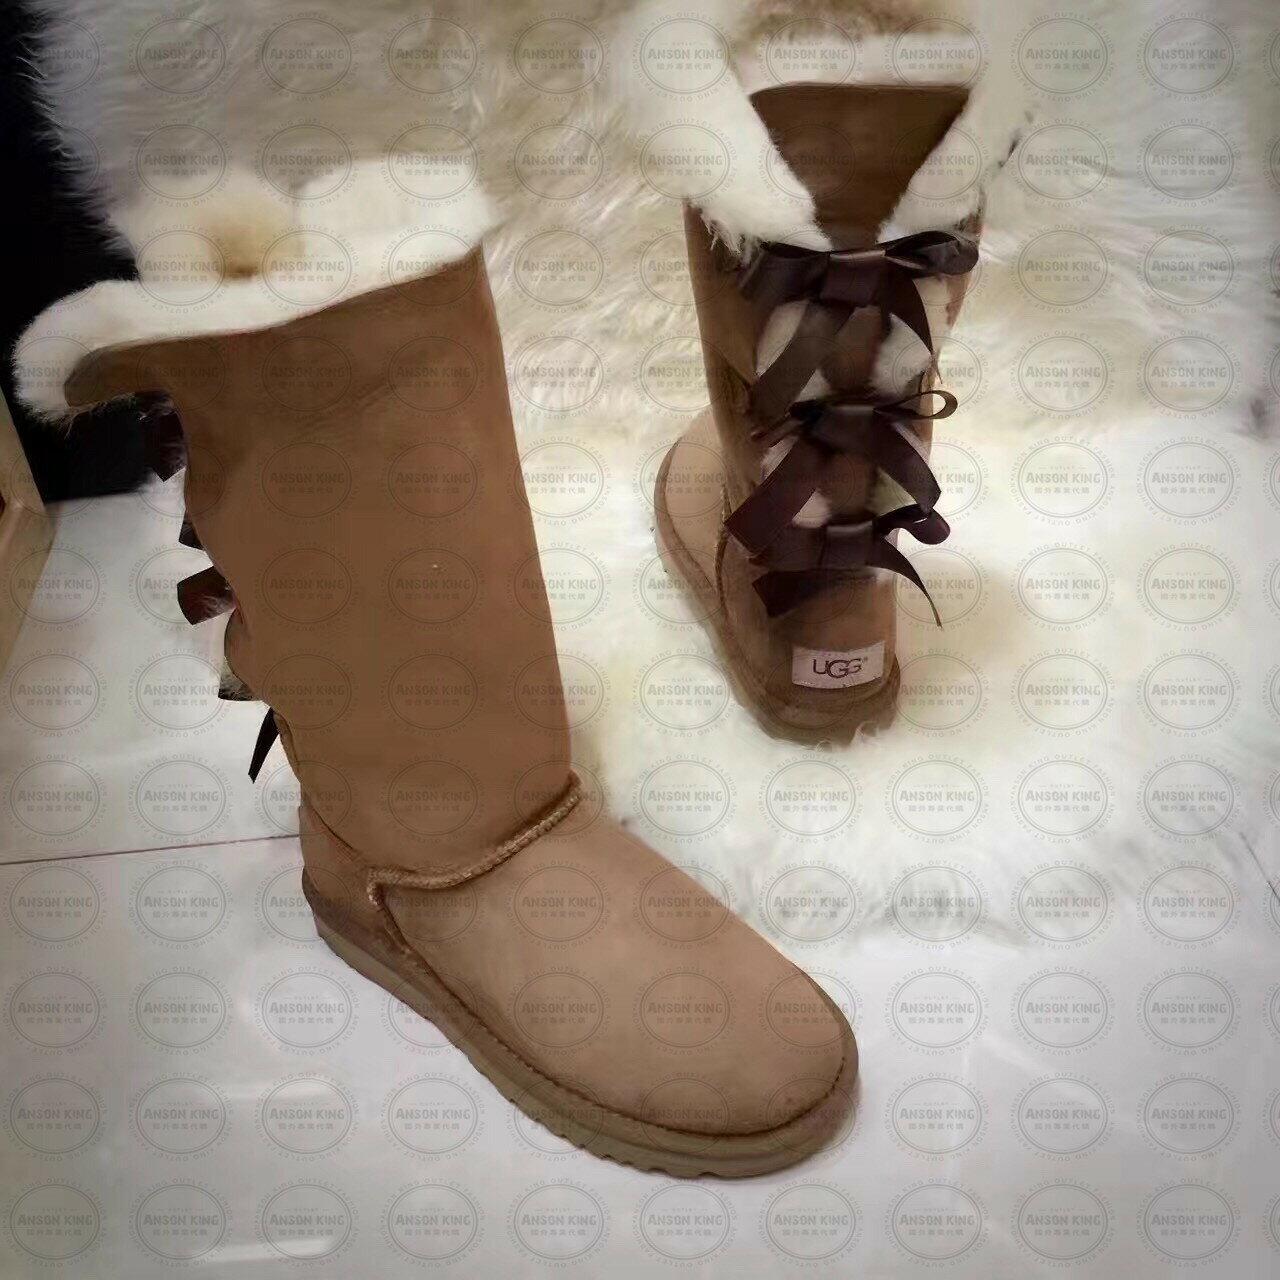 OUTLET正品代購 澳洲 UGG 一體女式絲帶蝴蝶結 保暖 真皮羊皮毛 雪靴 短靴 棕色 0